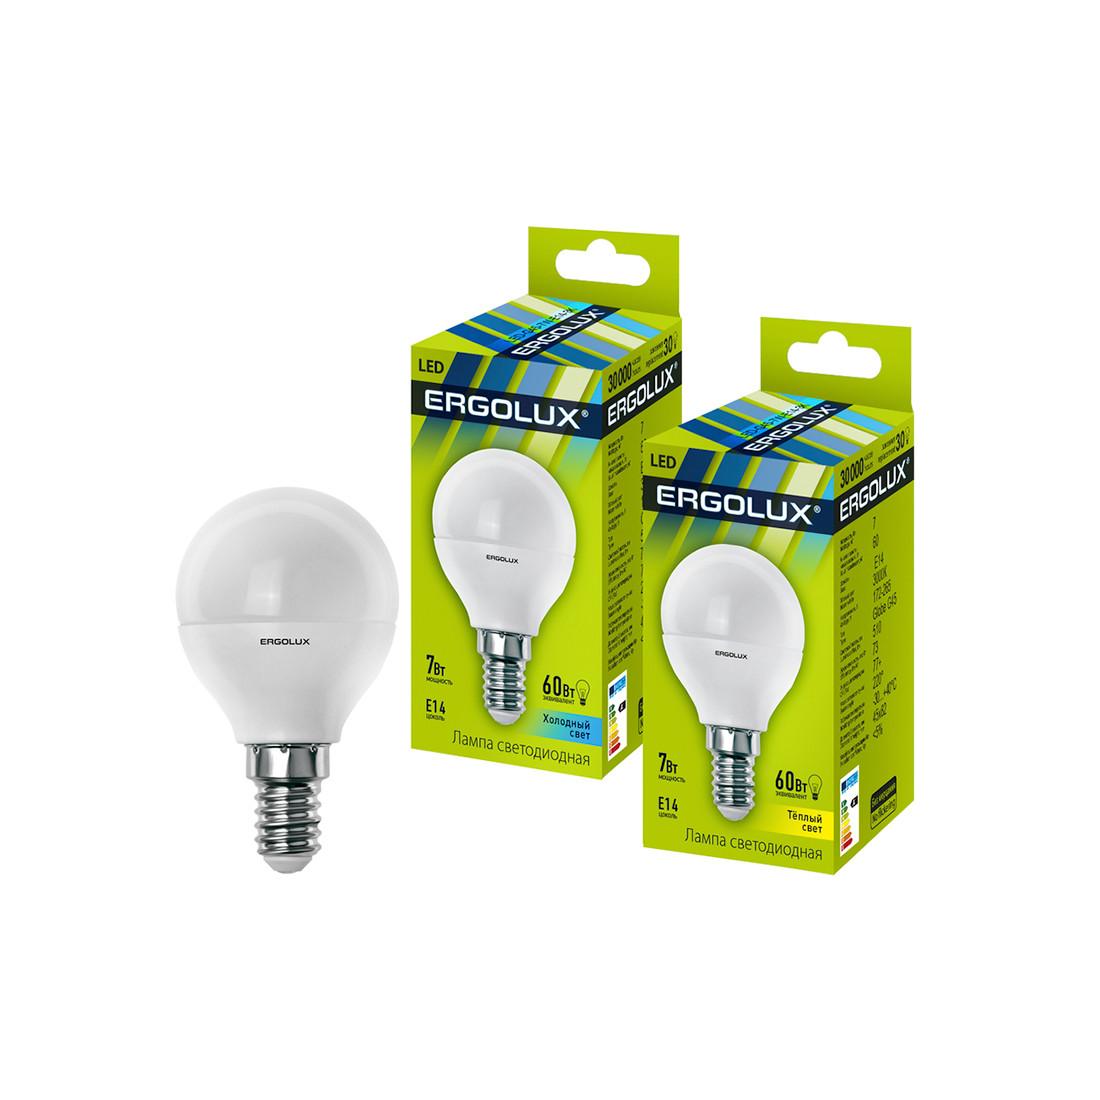 Эл. лампа светодиодная Ergolux G45/3000K/E14/7Вт, Тёплый